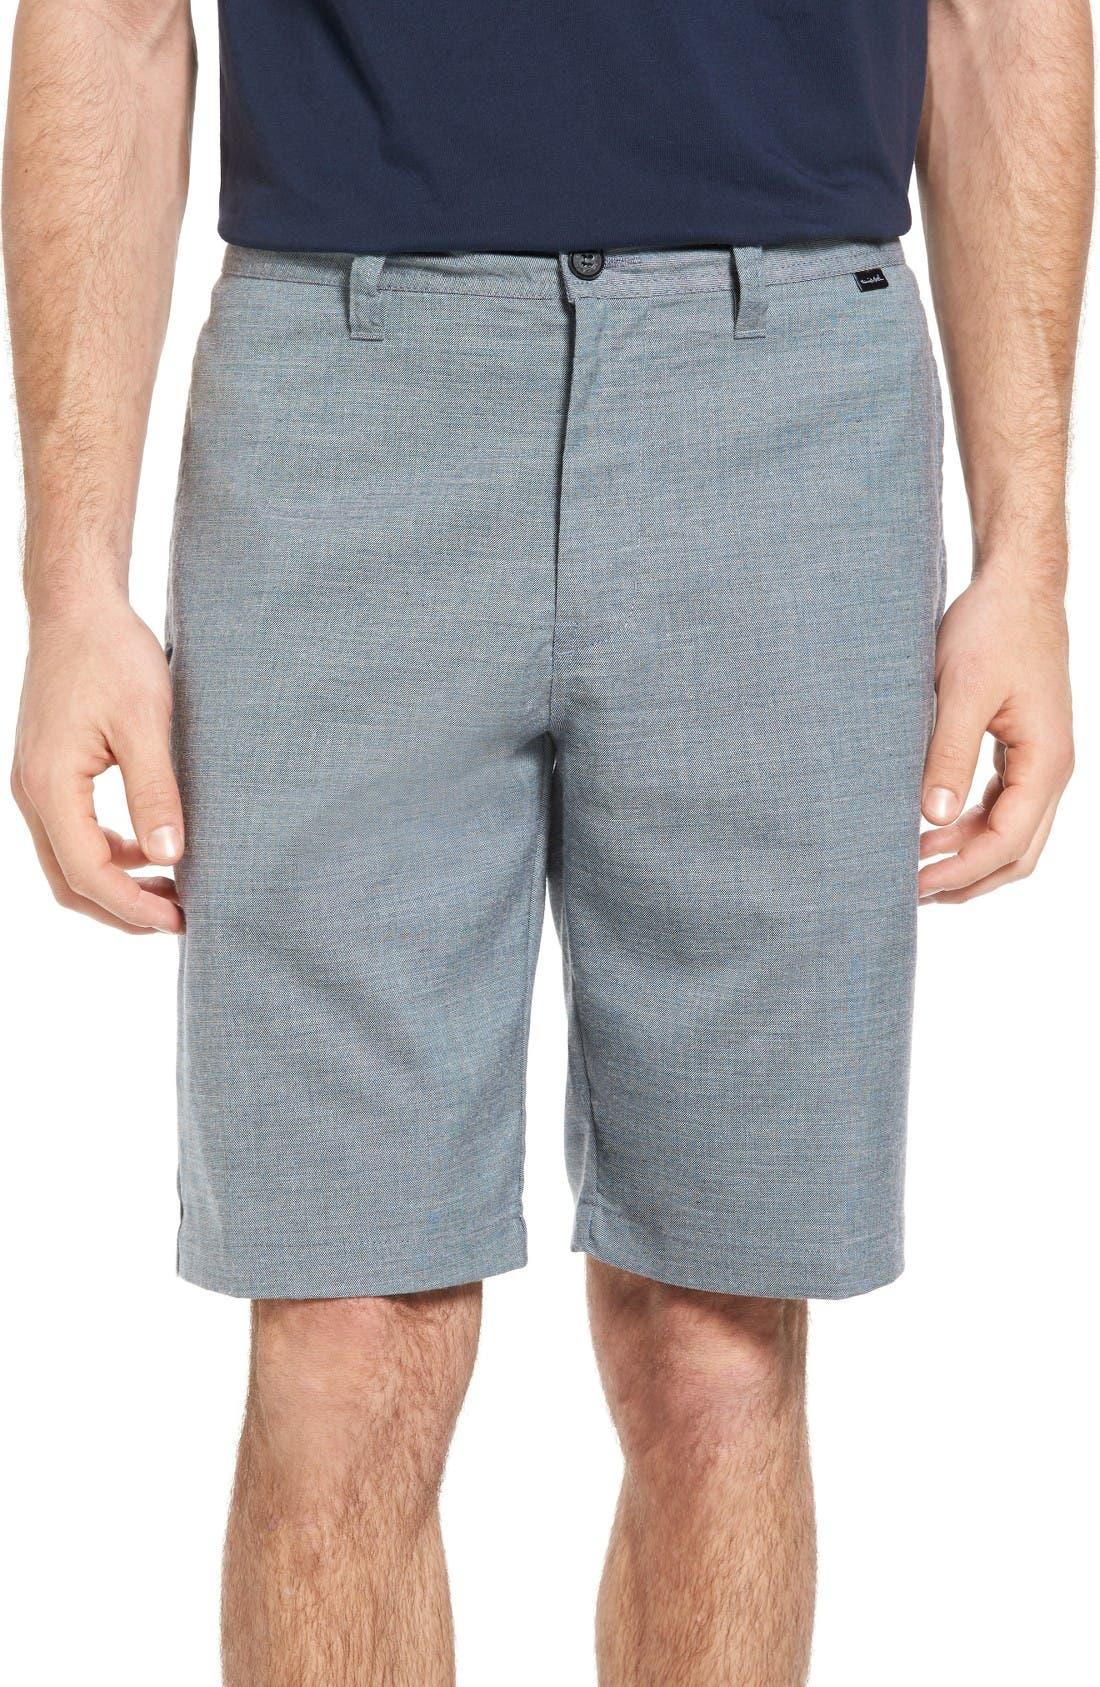 Alternate Image 1 Selected - Travis Mathew Romers Stretch Shorts